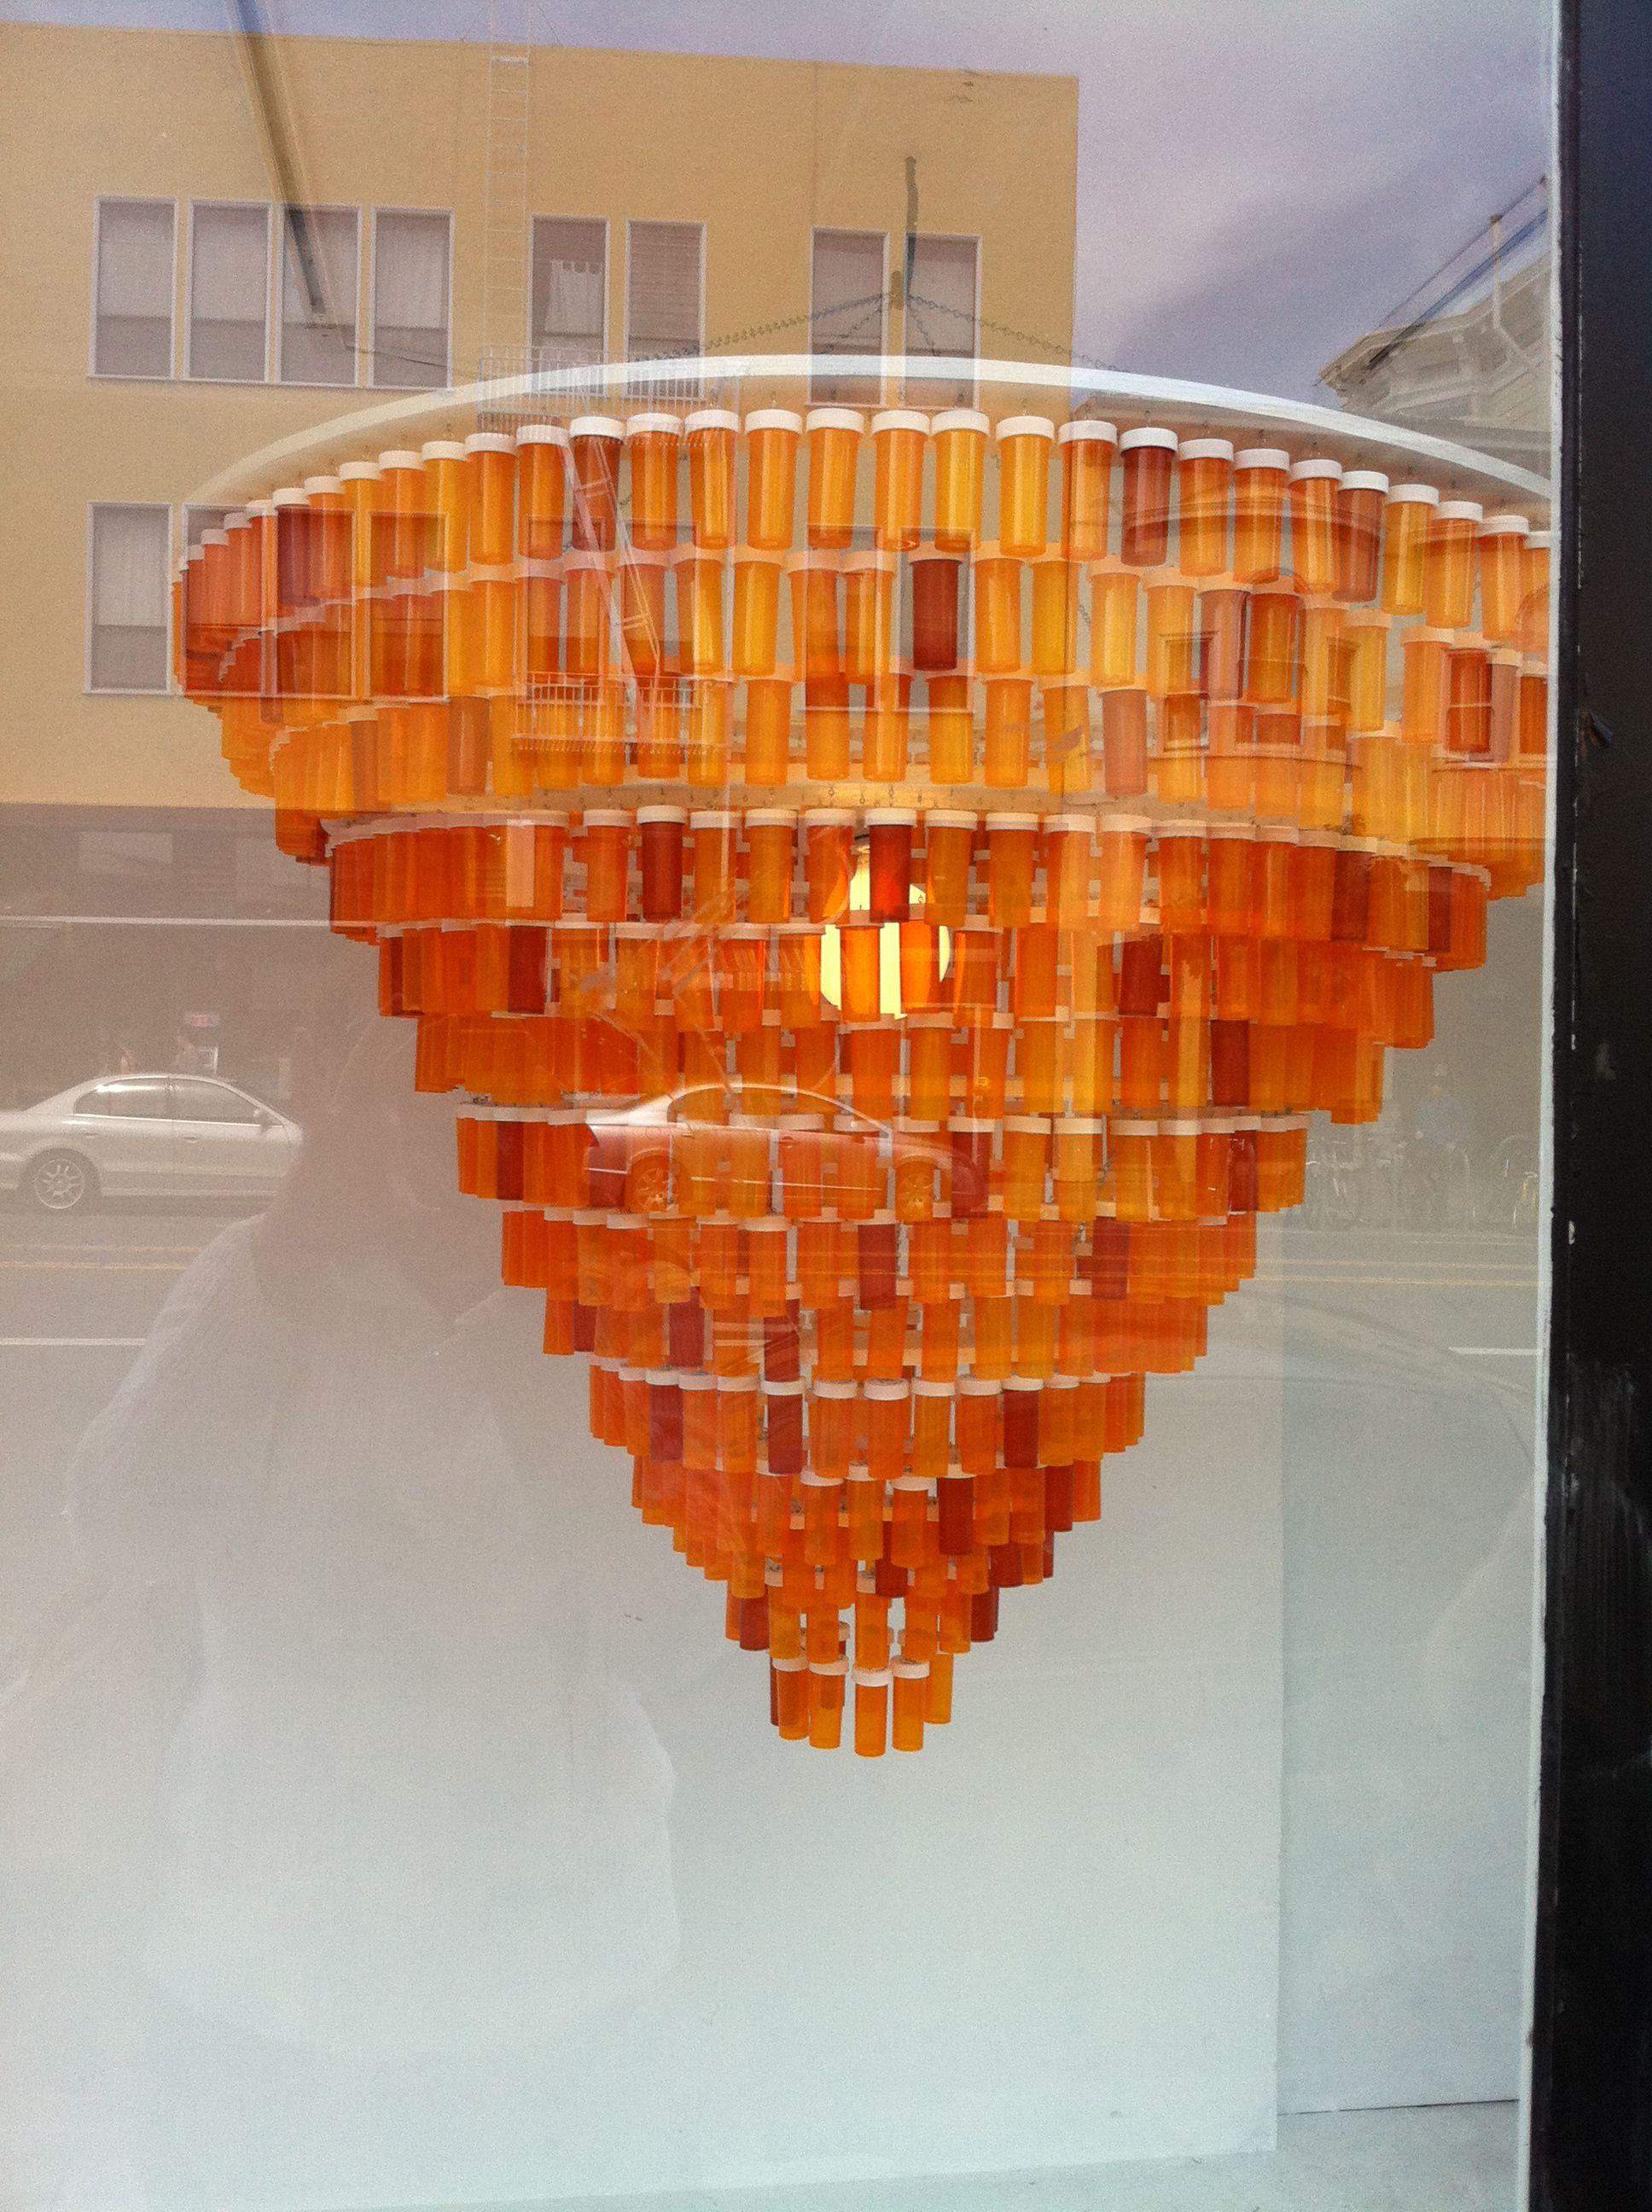 Cool chandelier prescription bottles bottle and repurposed cool chandelier arubaitofo Images